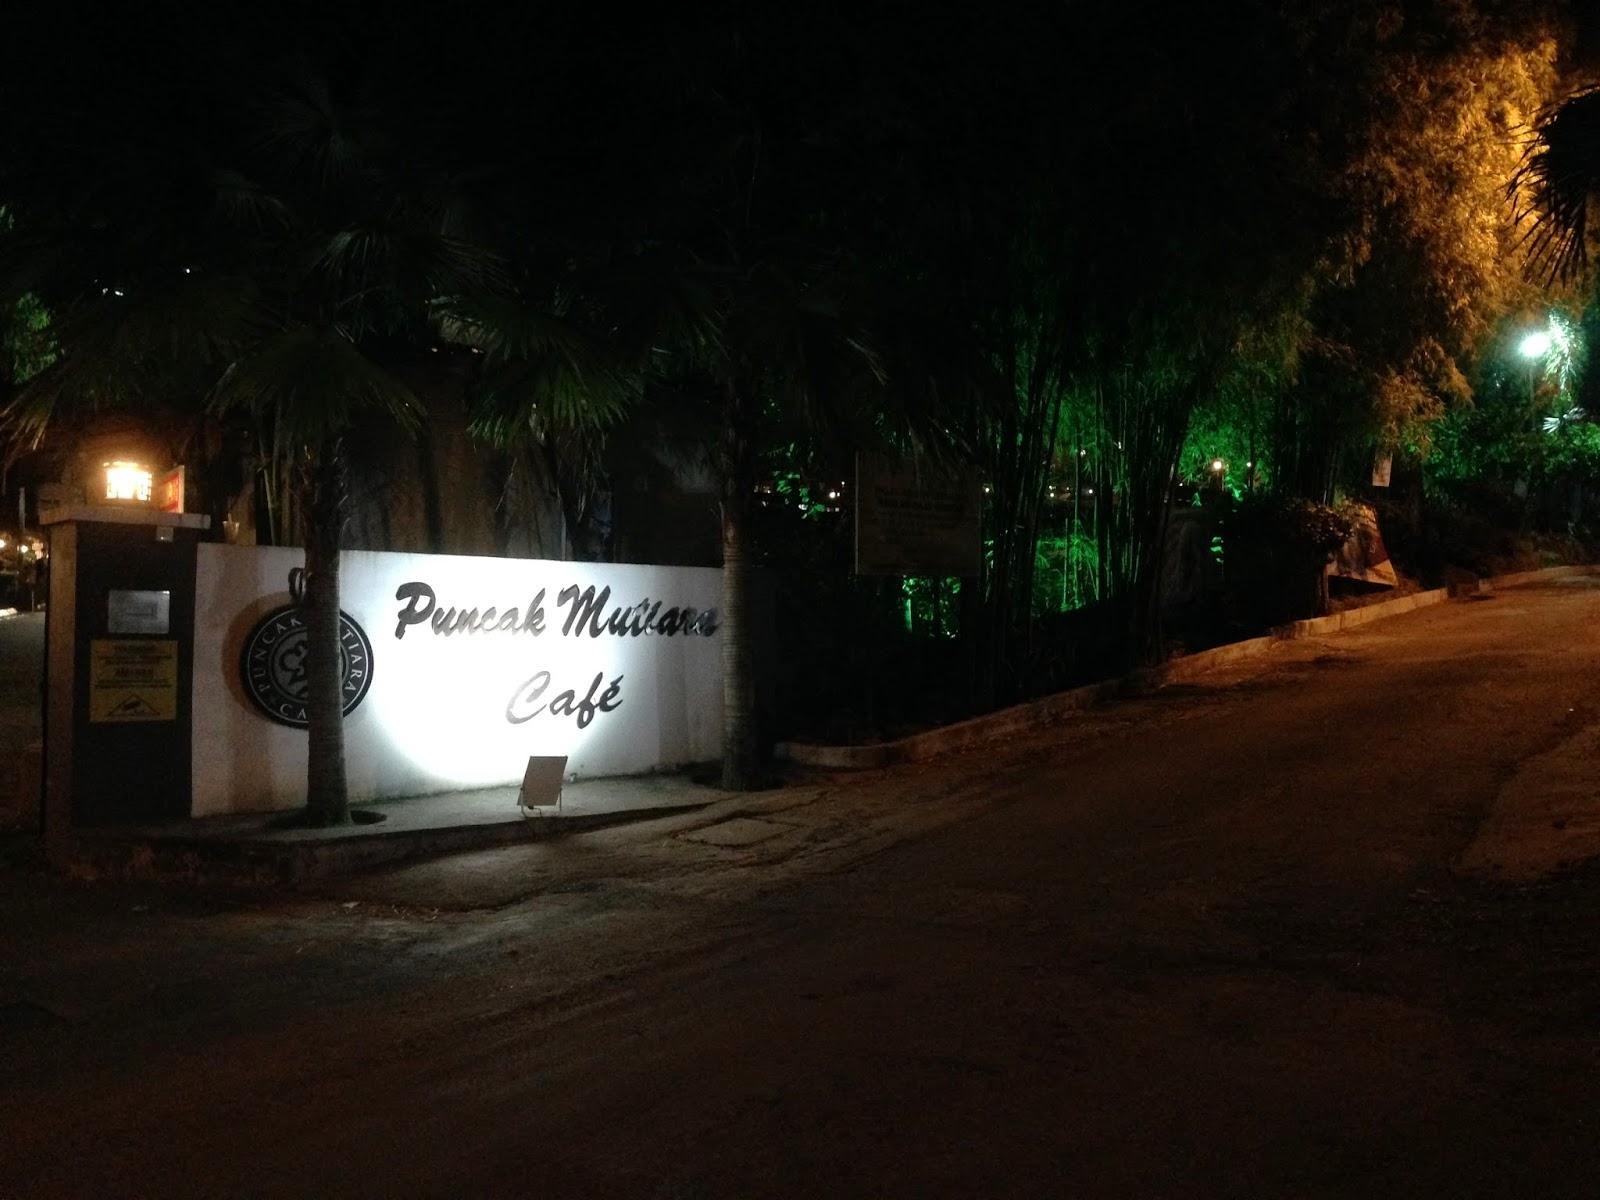 Puncak Mutiara Cafe entrance